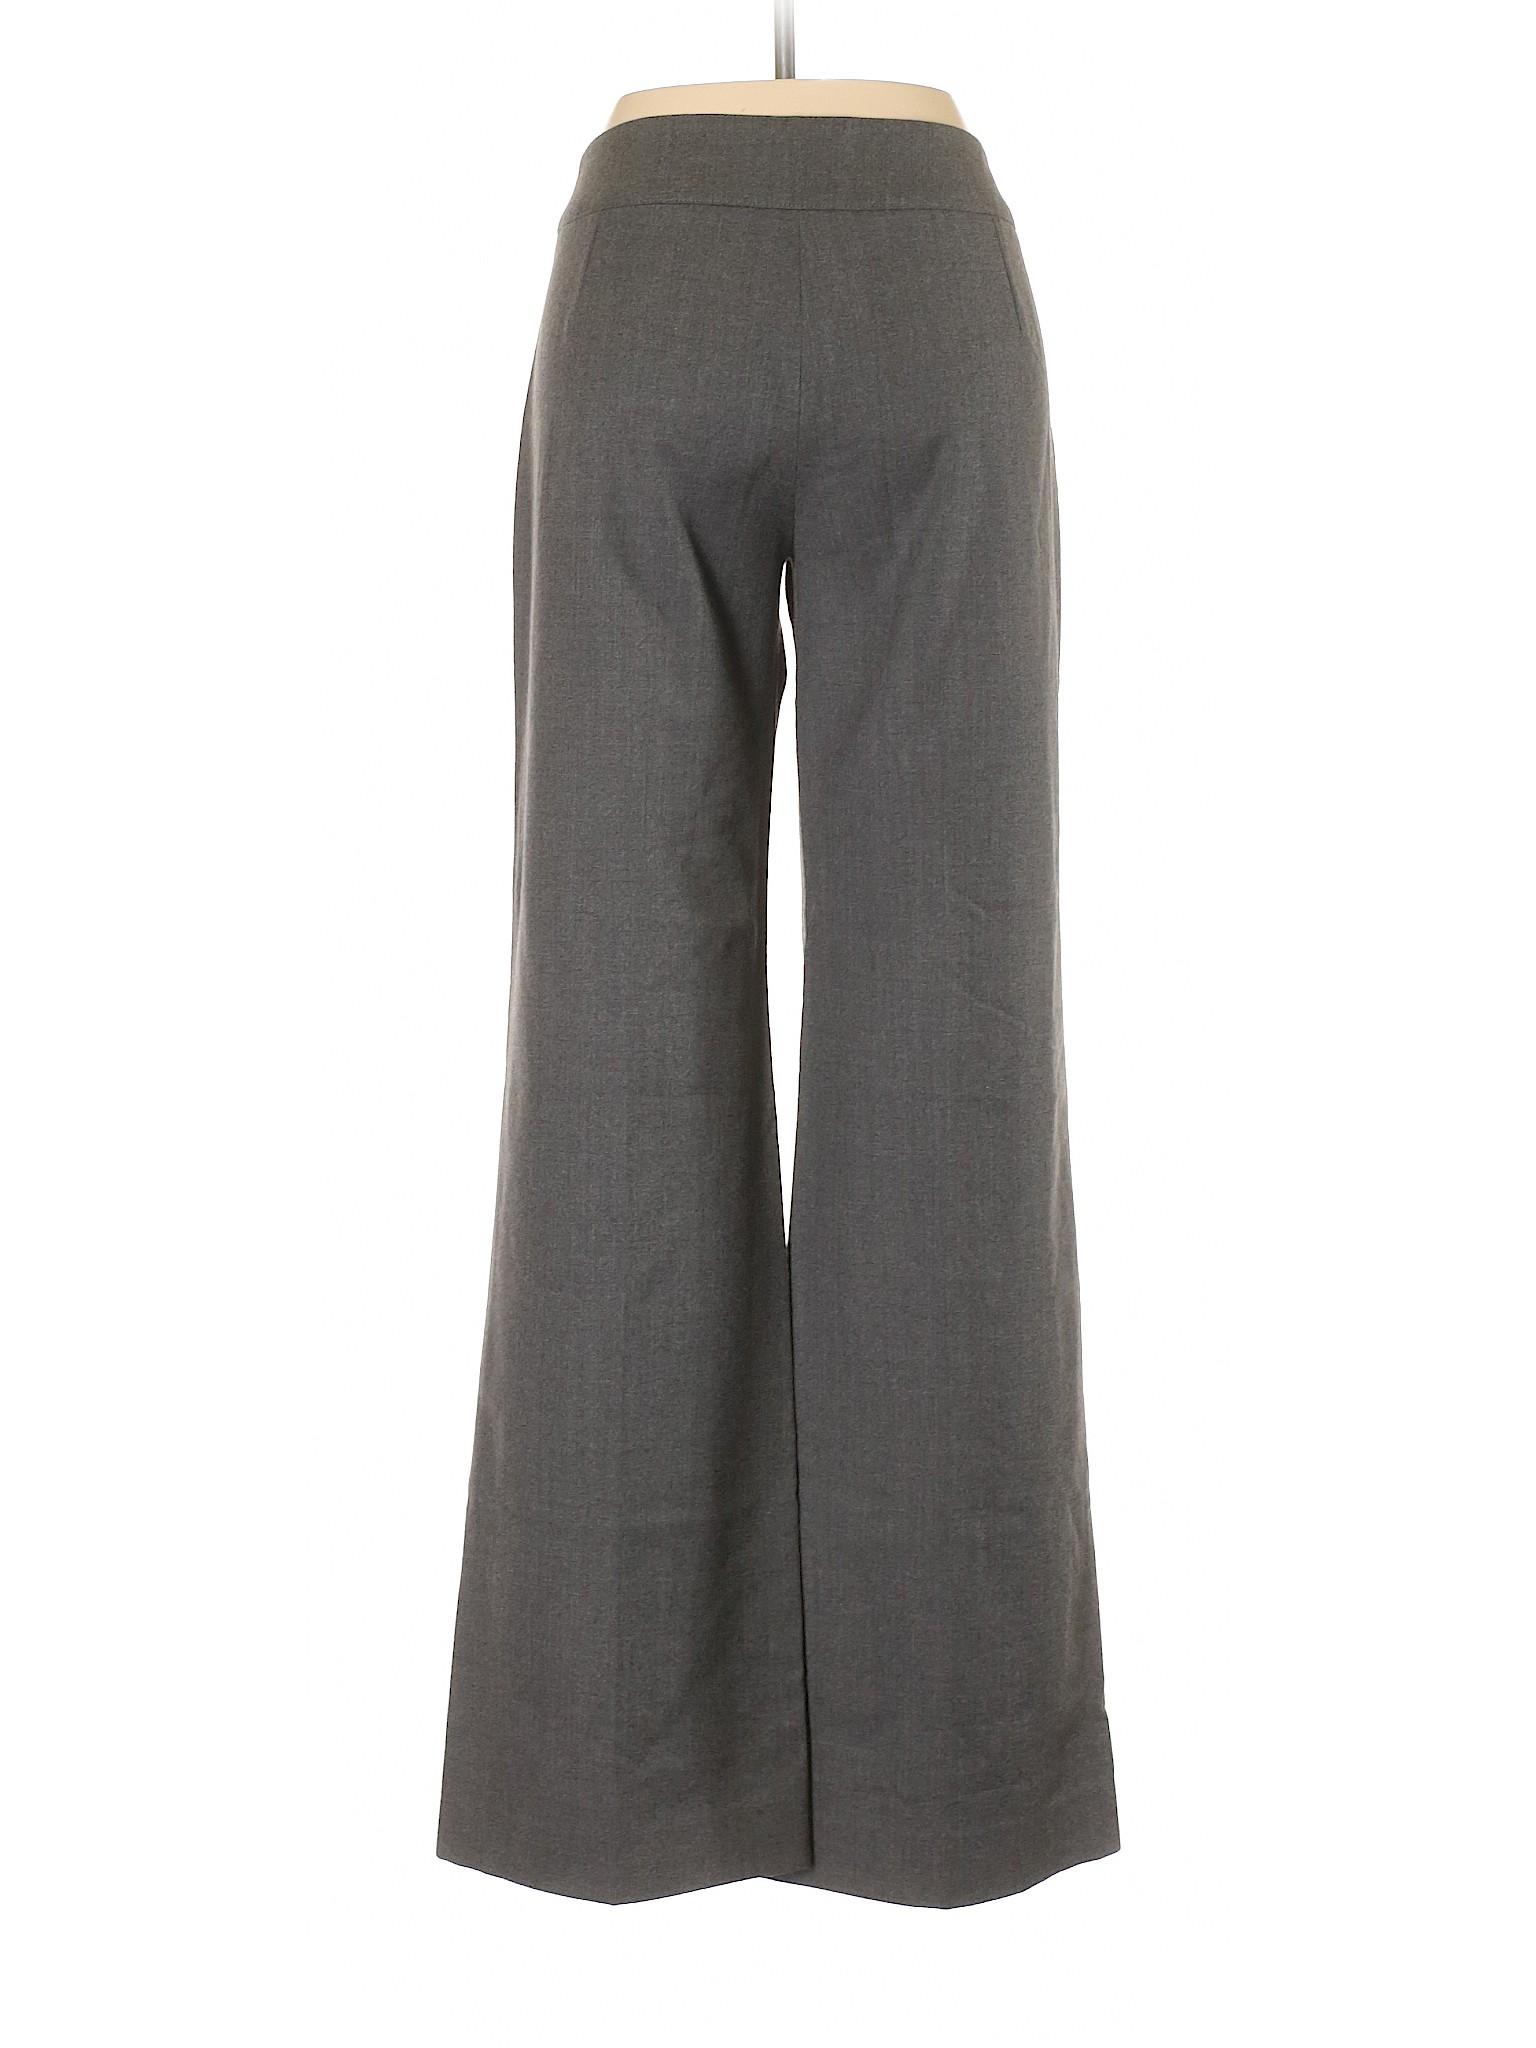 Wool leisure Collezioni Armani Pants Boutique XH7vq